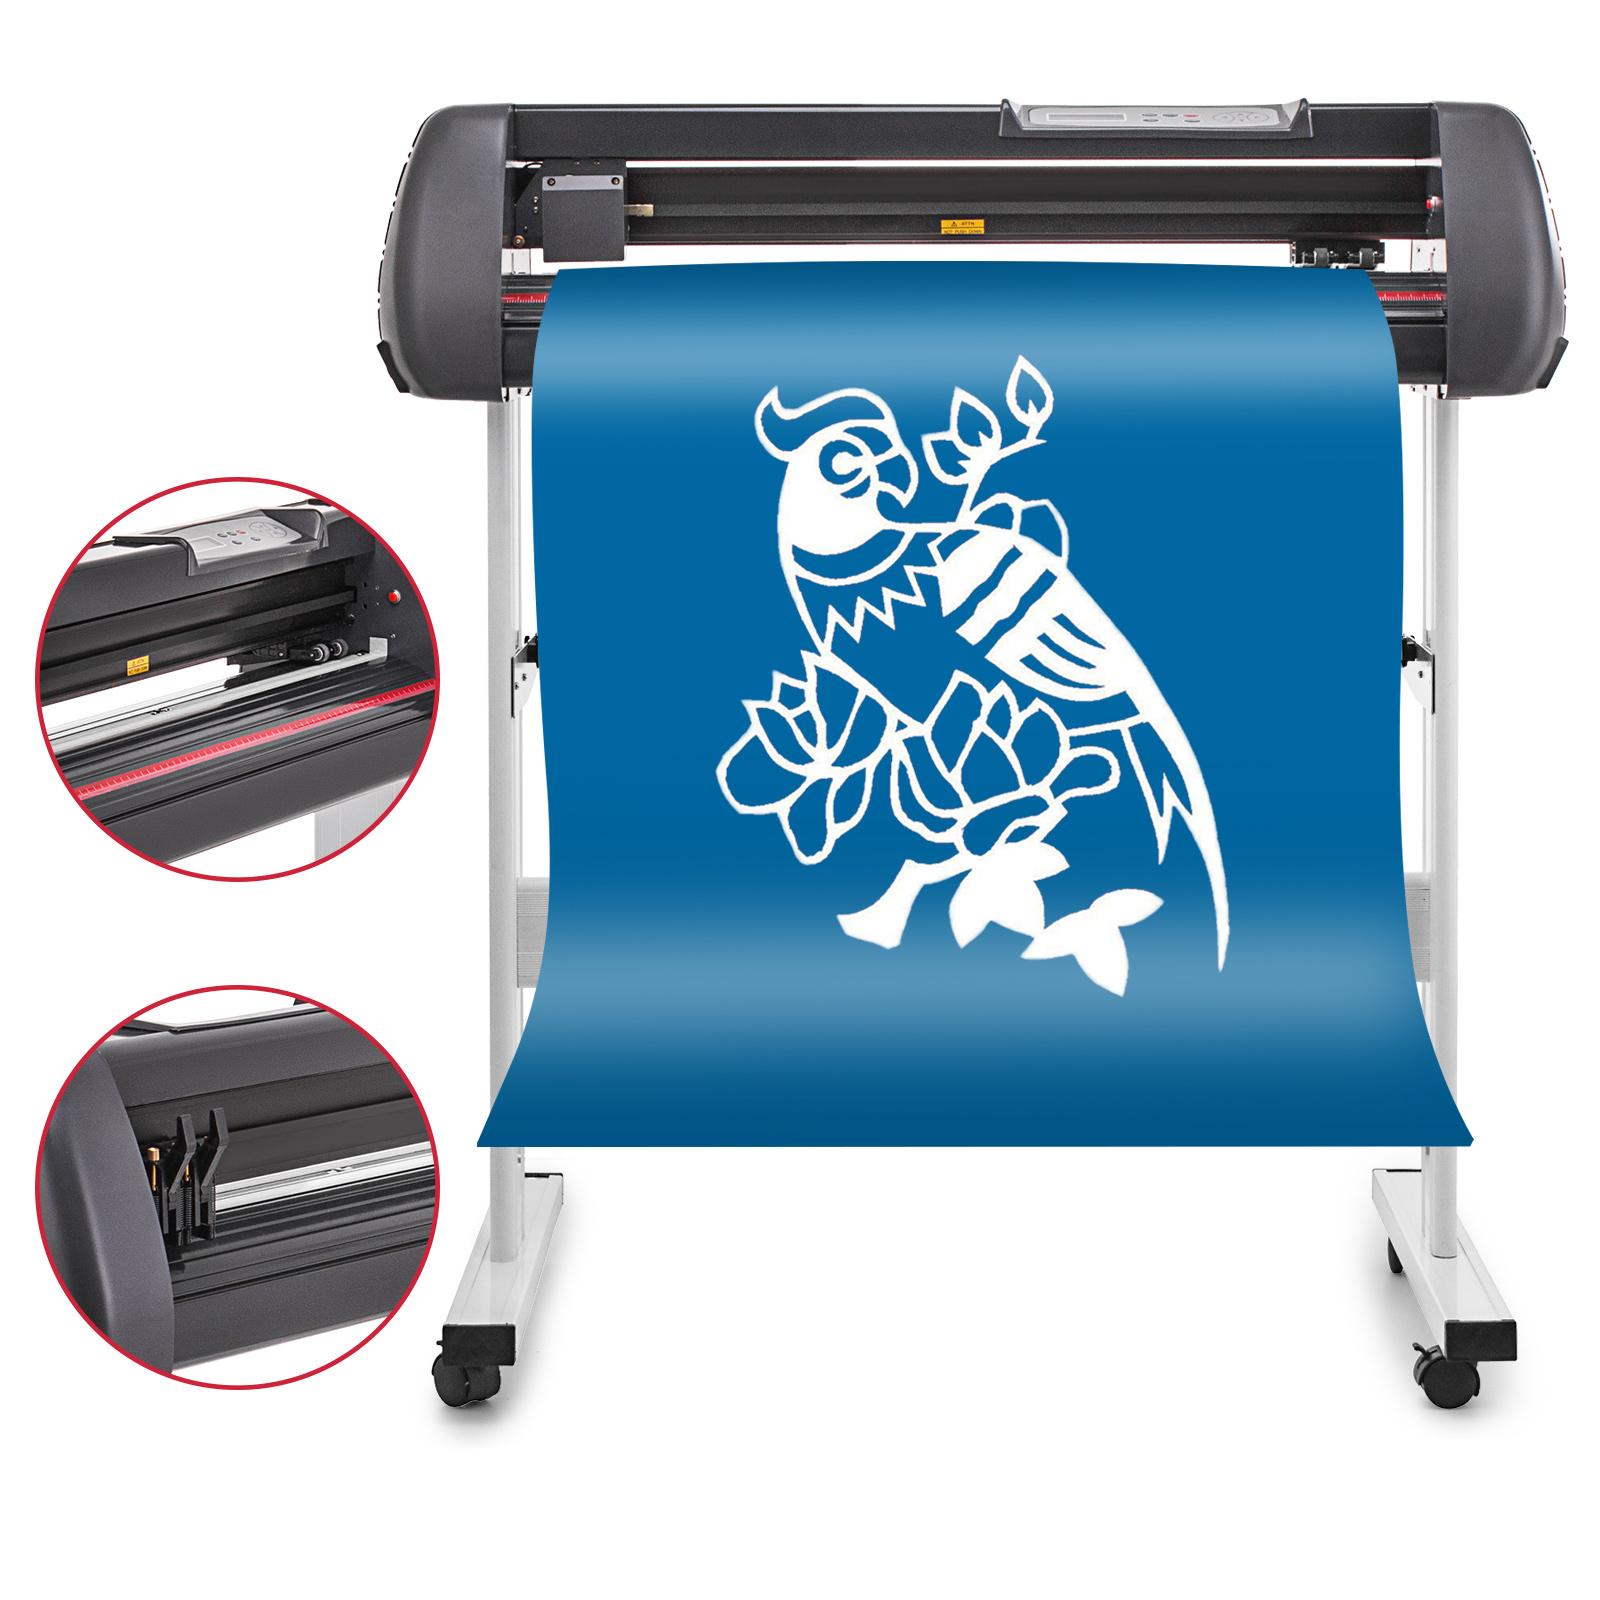 Details about vinyl cutter plotter cutting 28 sign sticker making print software 3 blades usb